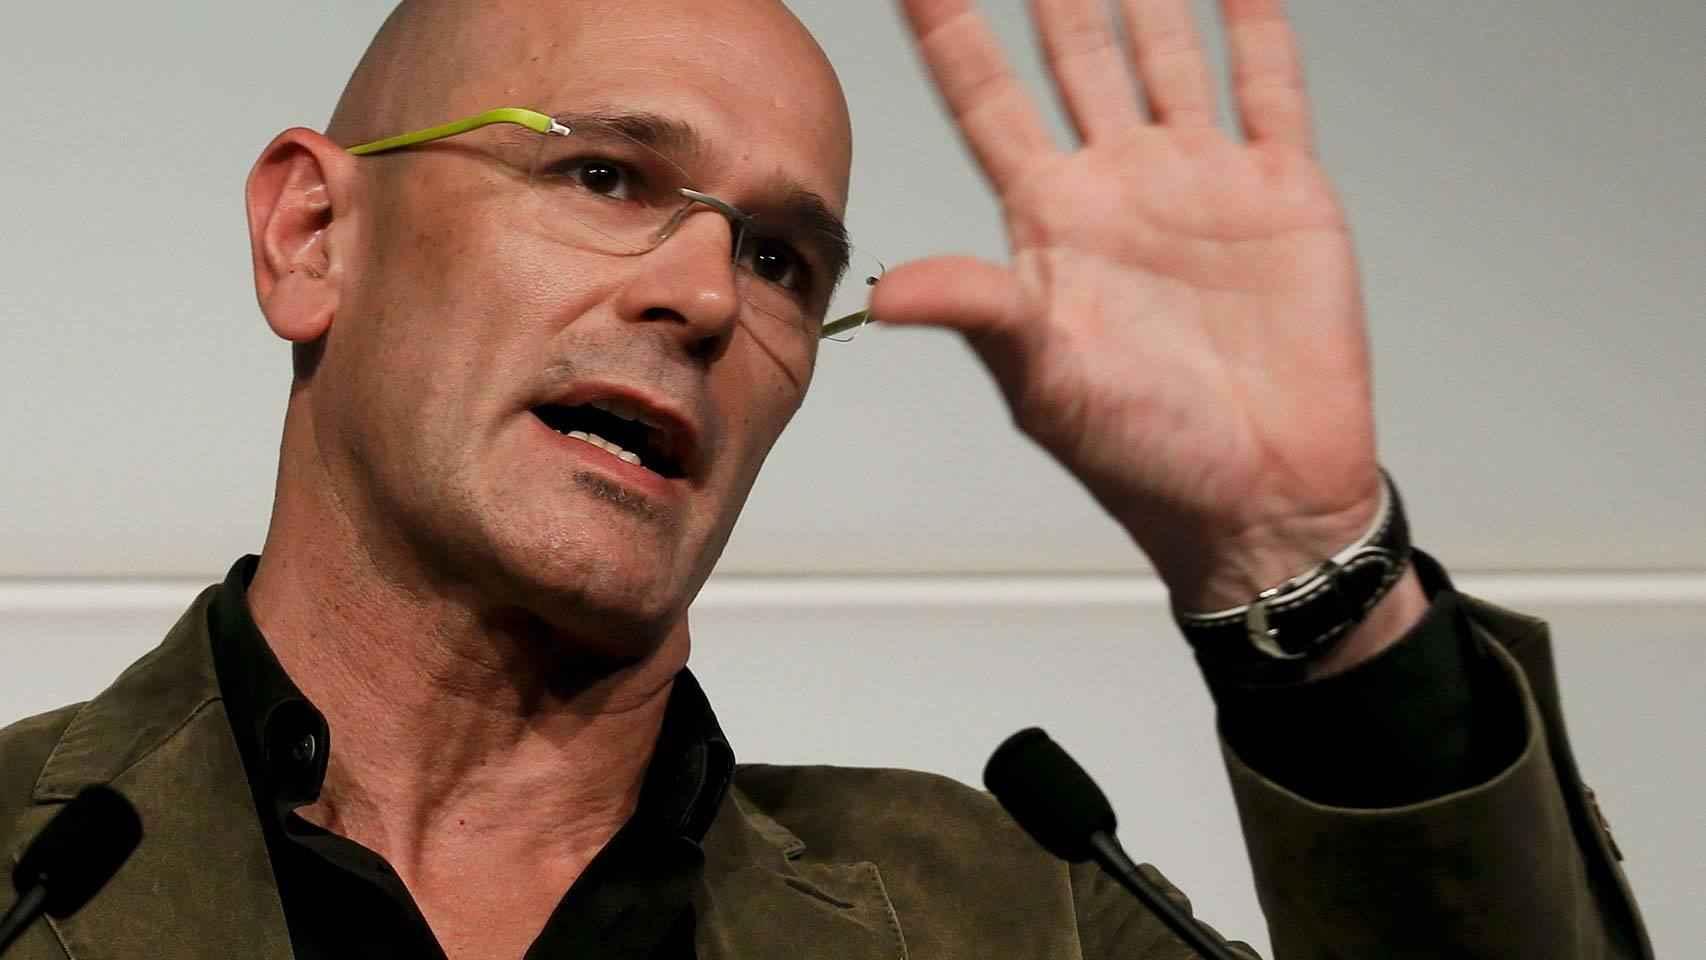 El número 1 de Junt pel Si, Raul Romeva, durante una rueda de prensa.